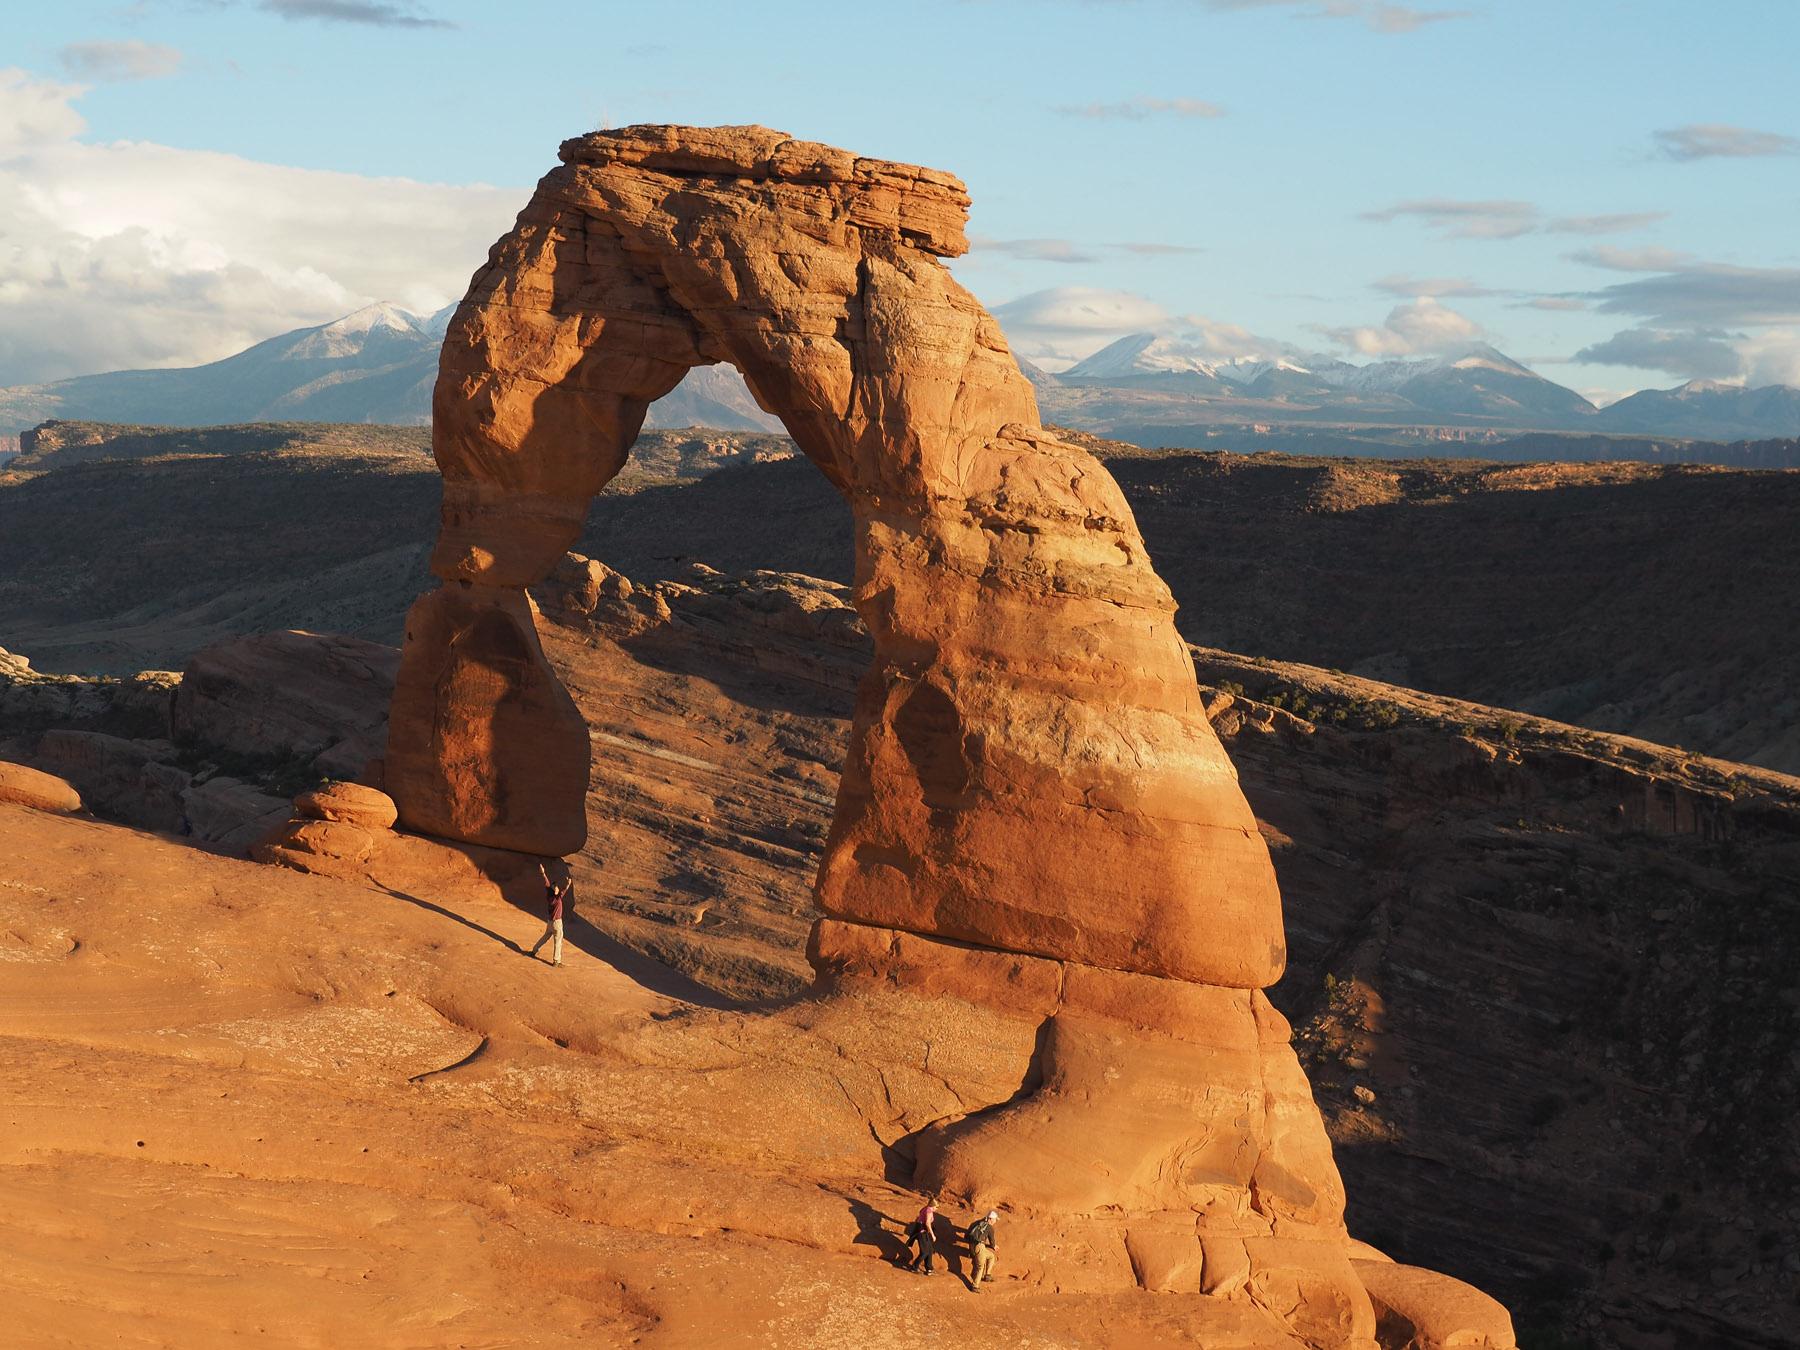 Der berühmte Delicate Arch - so schön!